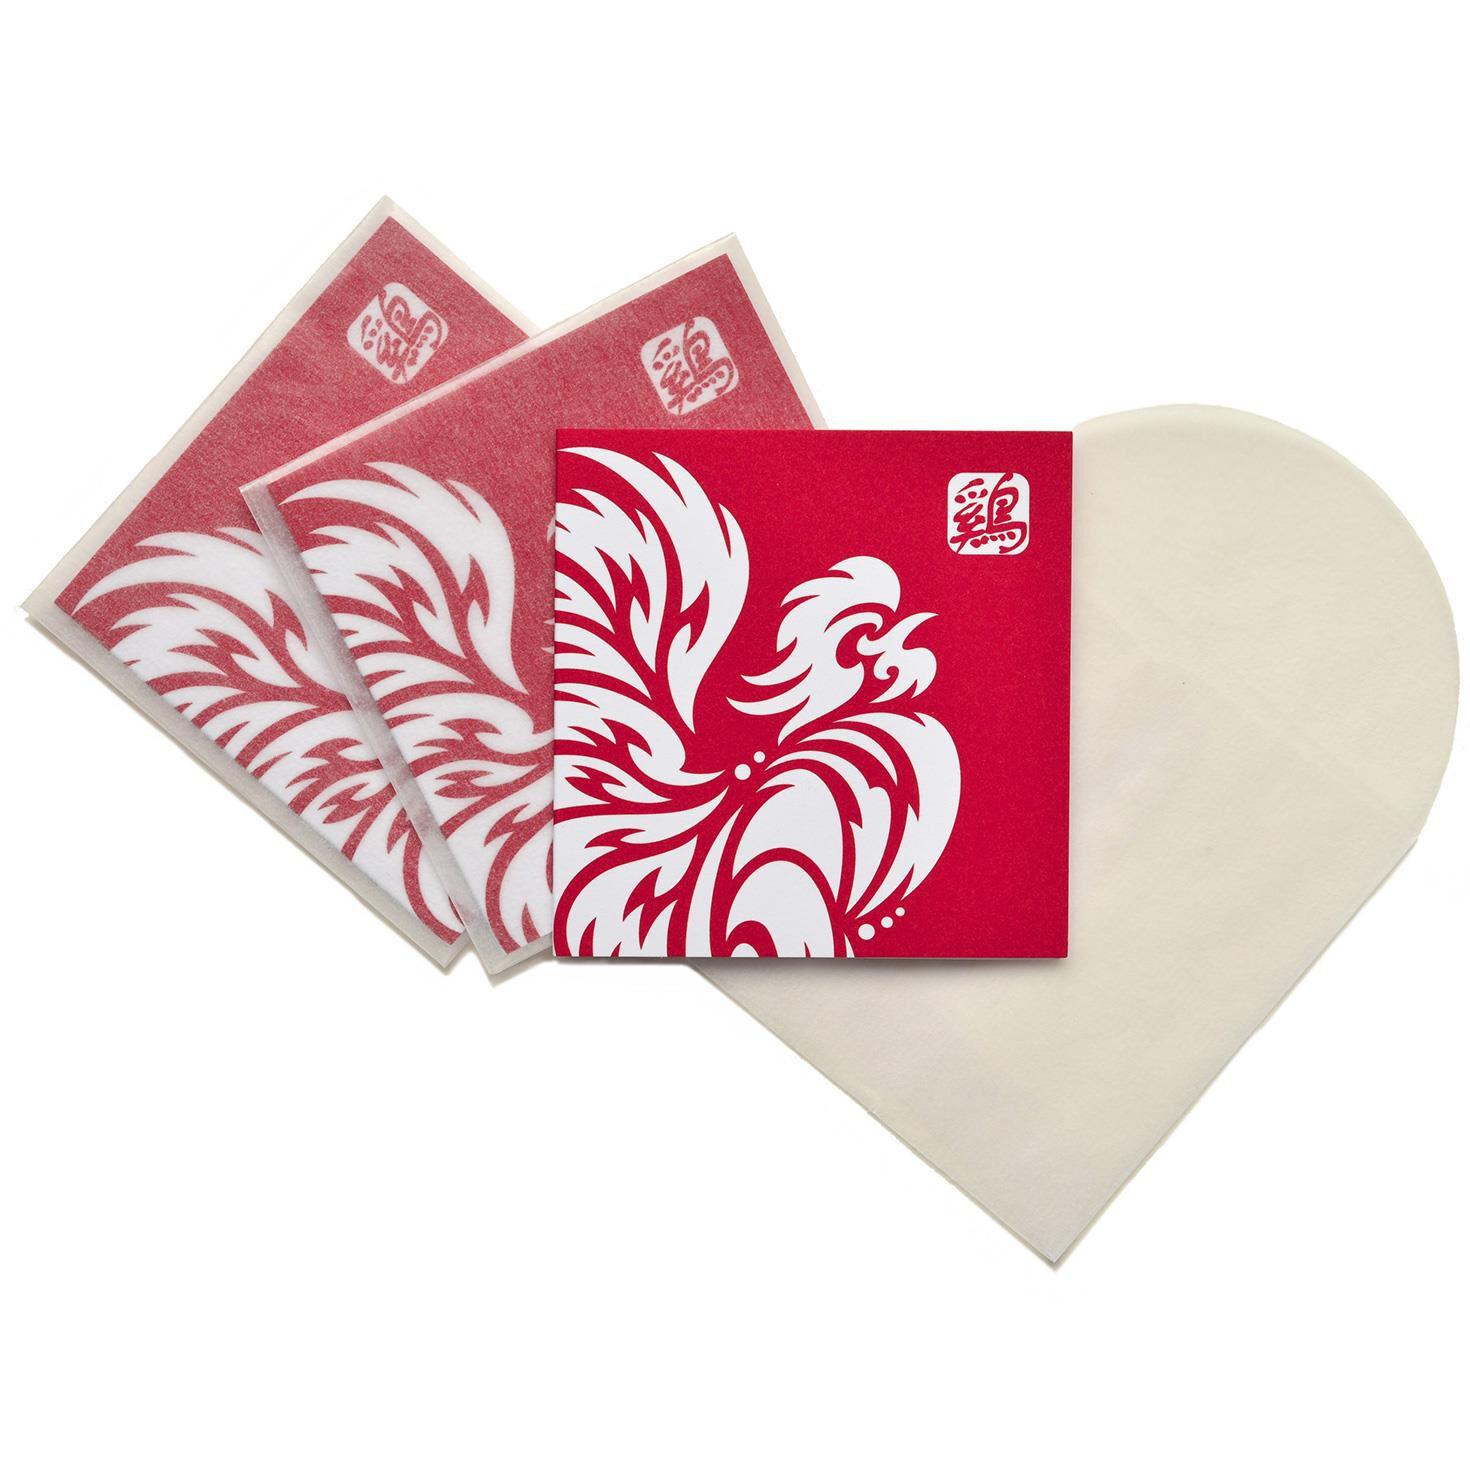 Lunar New Year Note Cards & Stationery | Hallmark